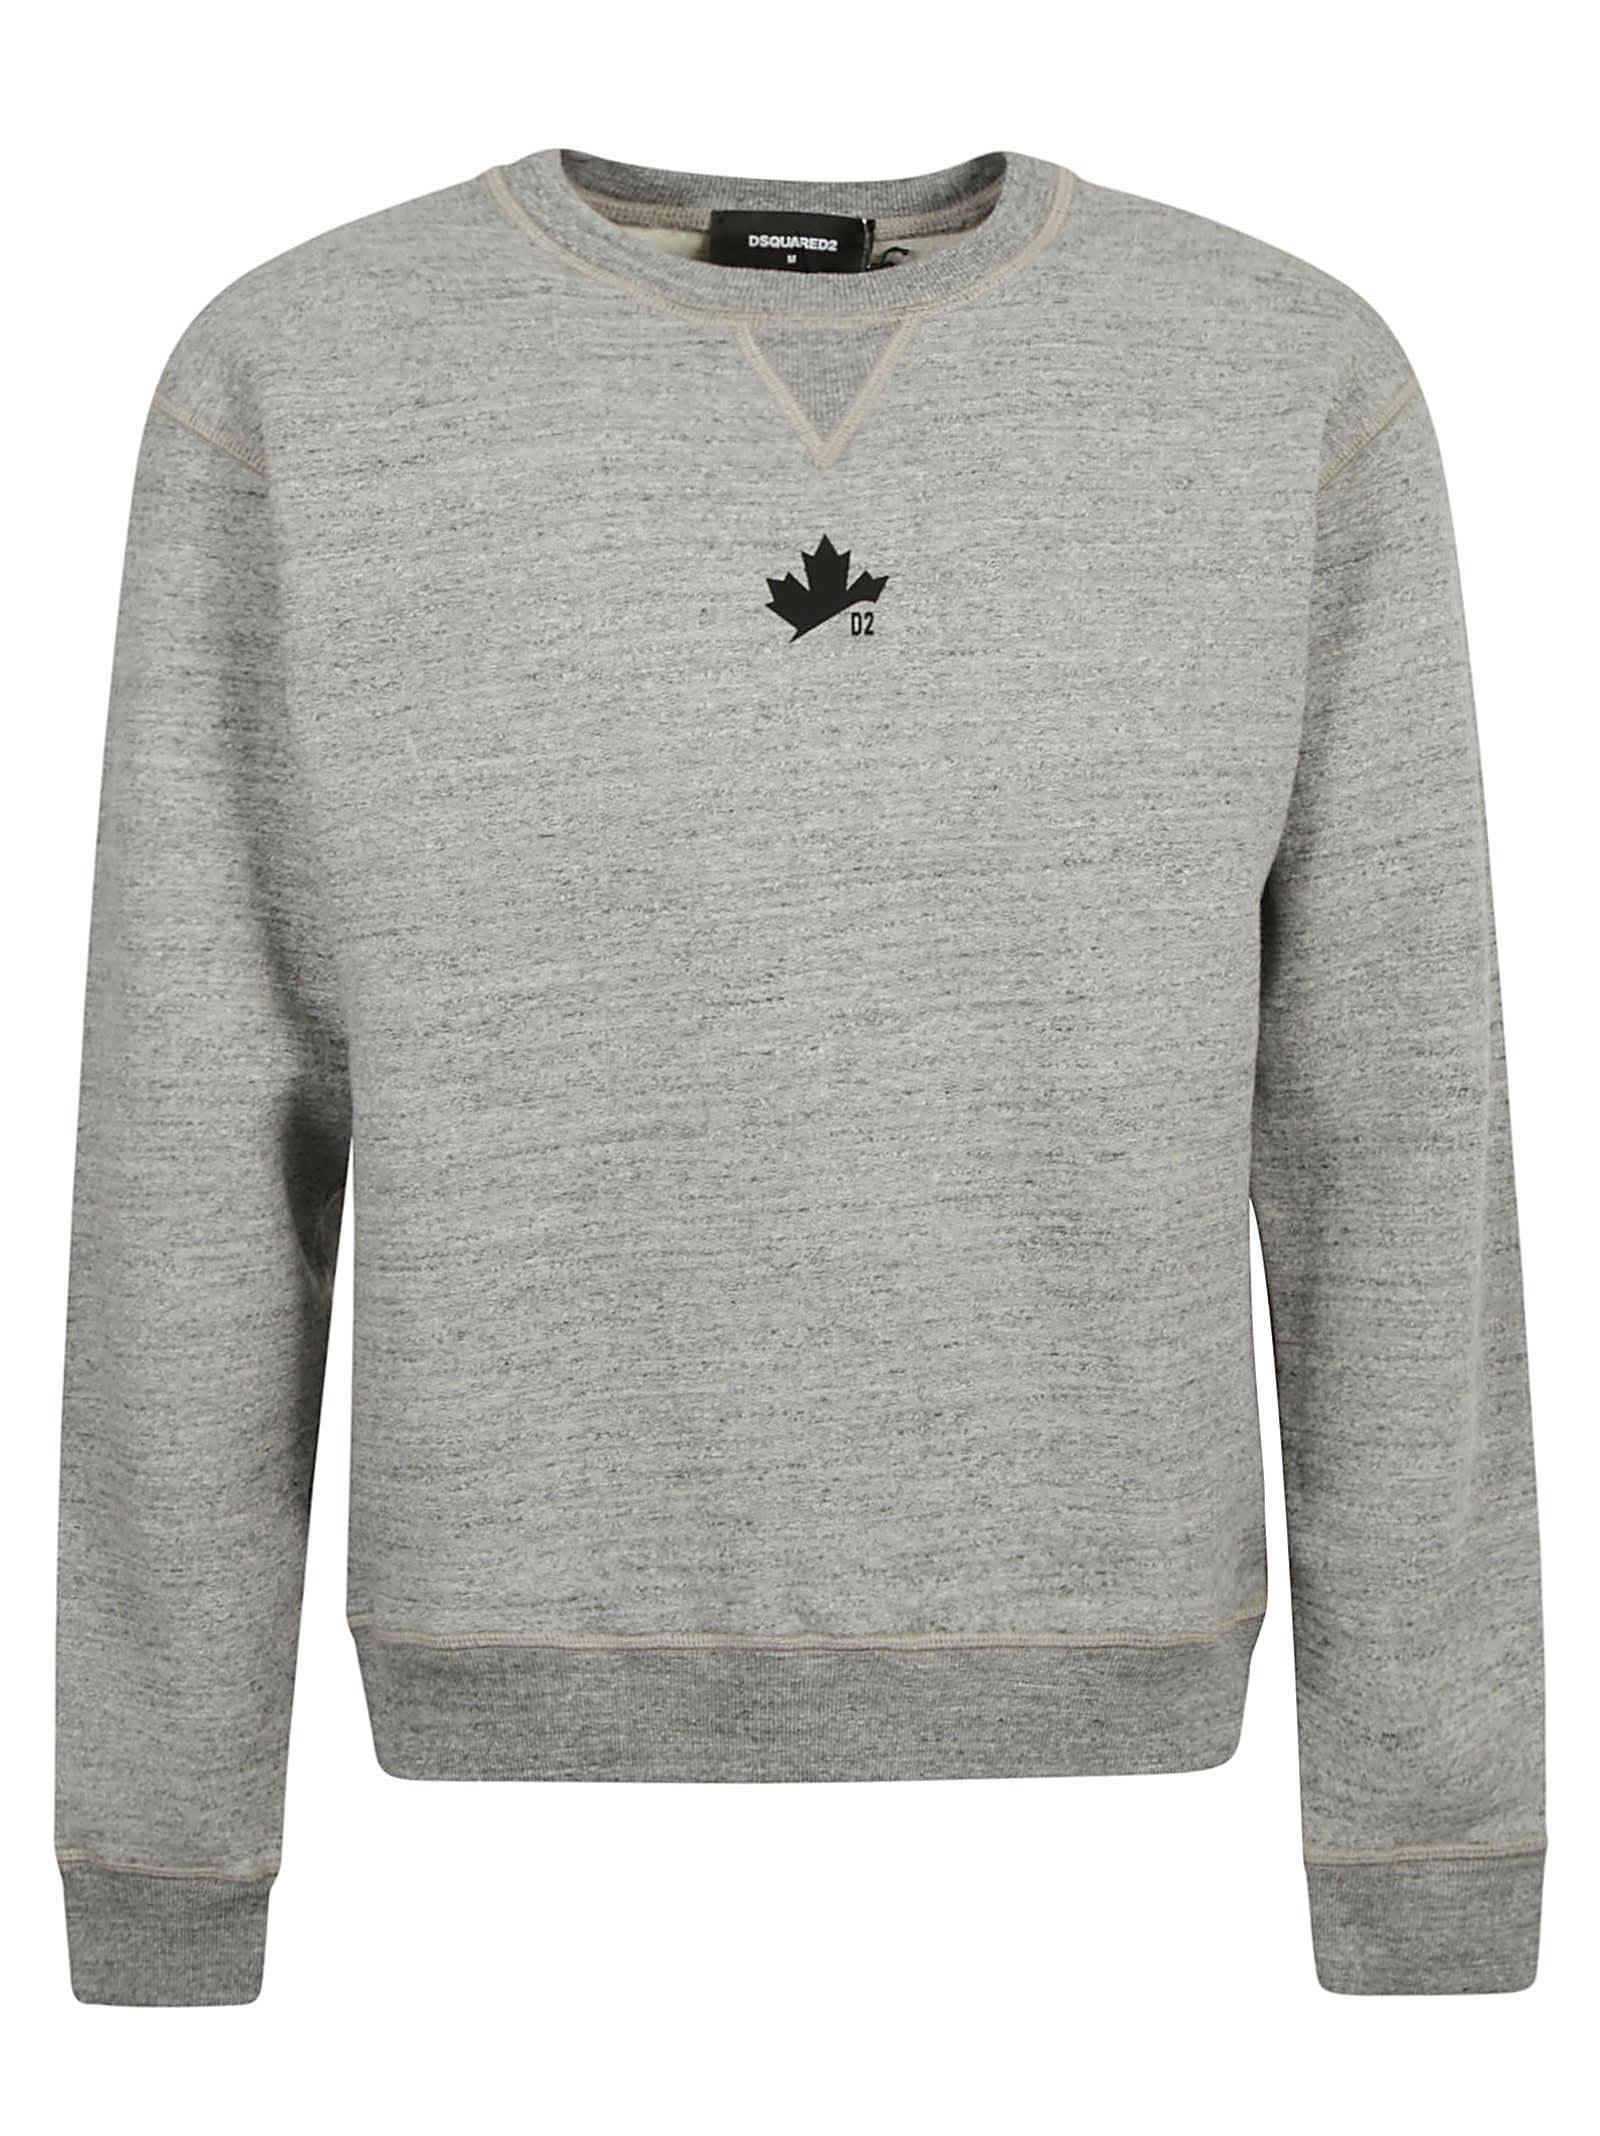 Dsquared2 D2 Sweatshirt